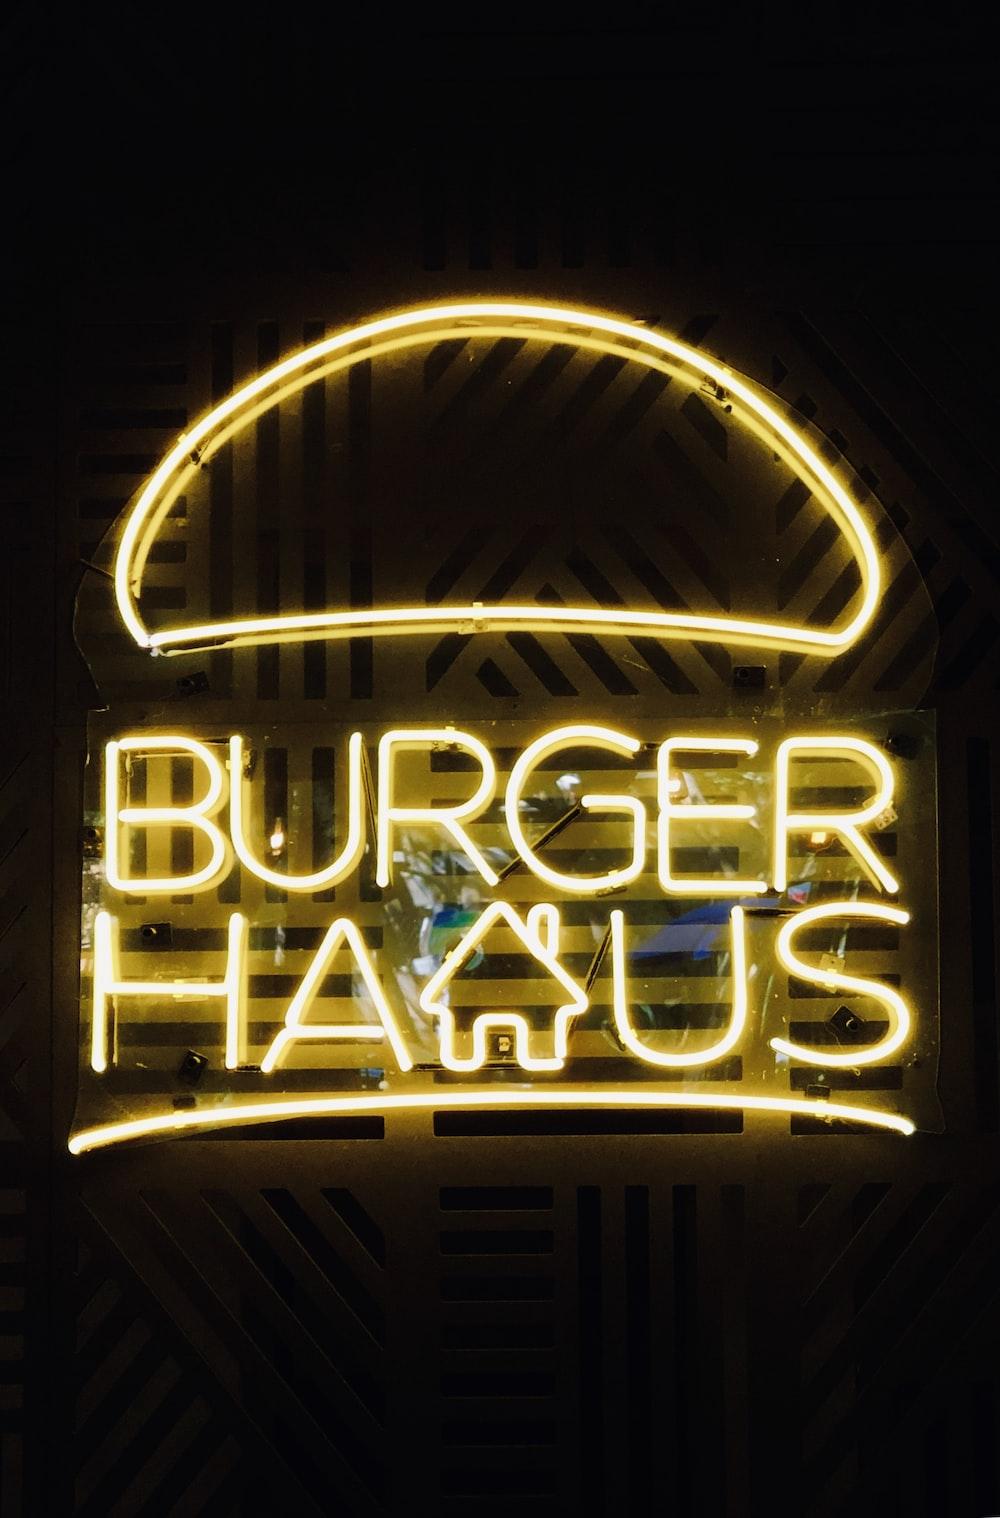 Burger haus signage